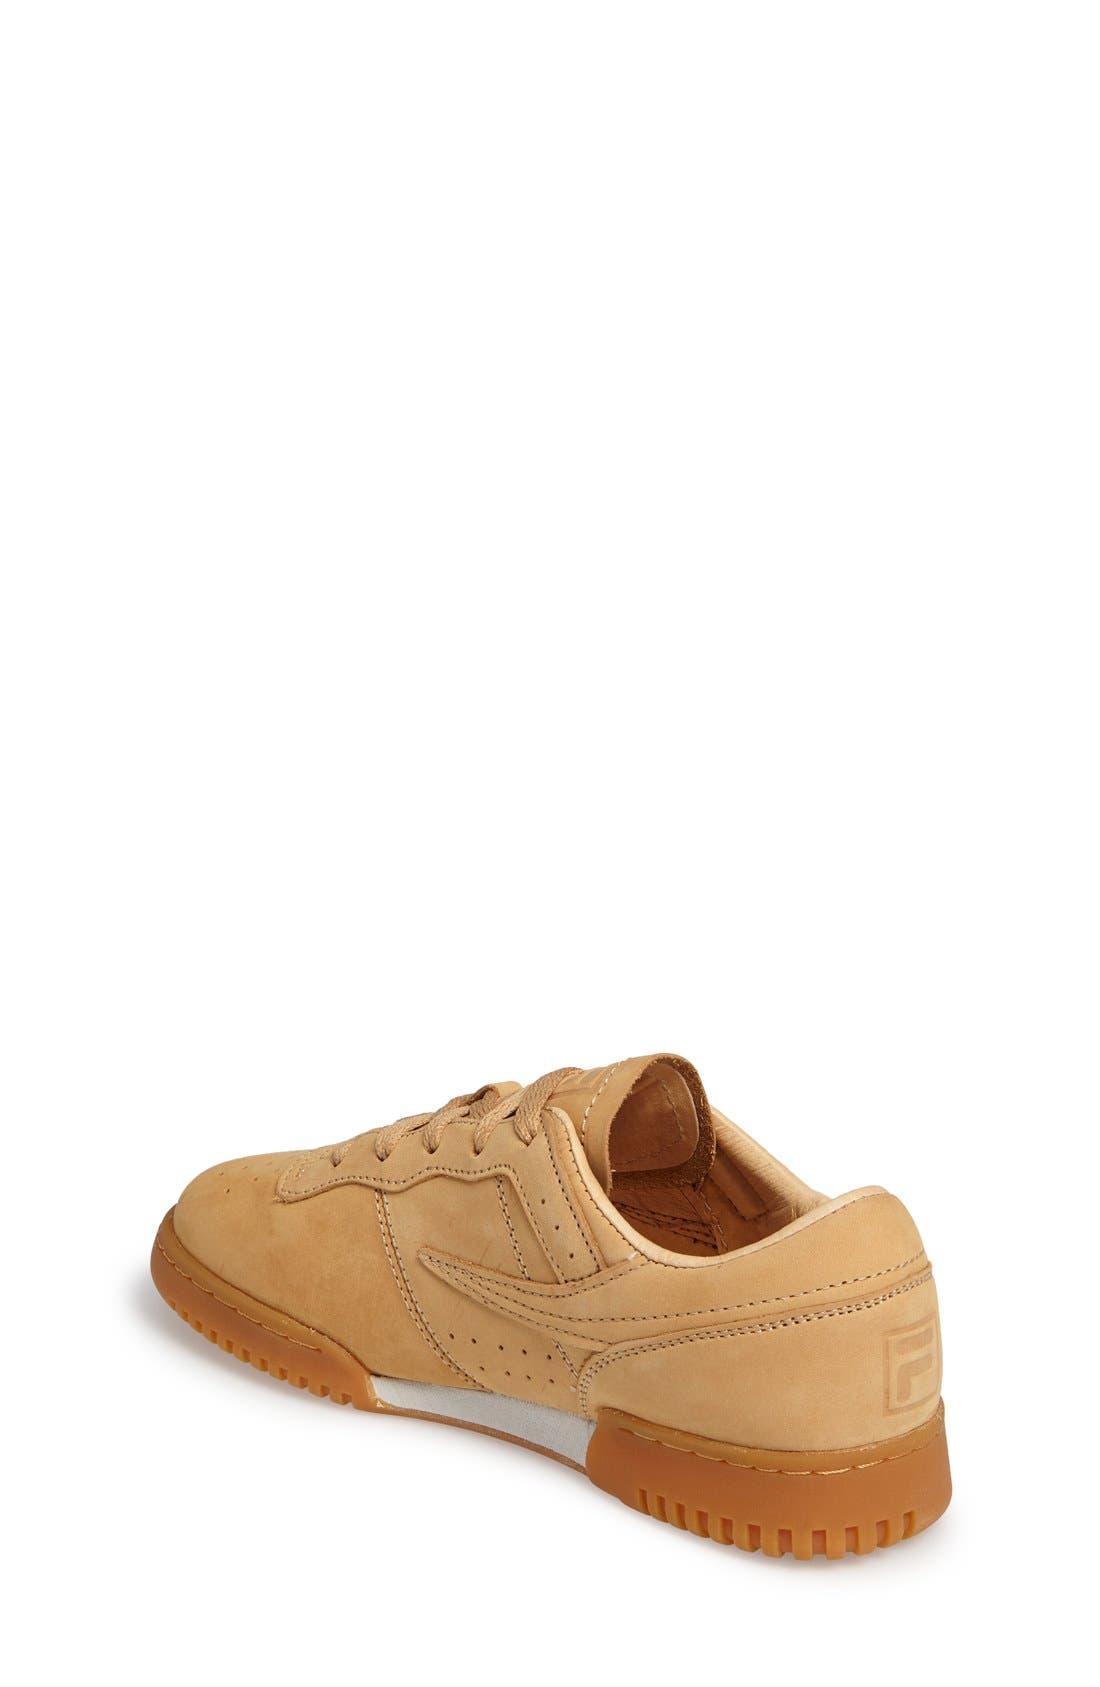 USA Heritage Sneaker,                             Alternate thumbnail 2, color,                             Tan Nubuck Leather